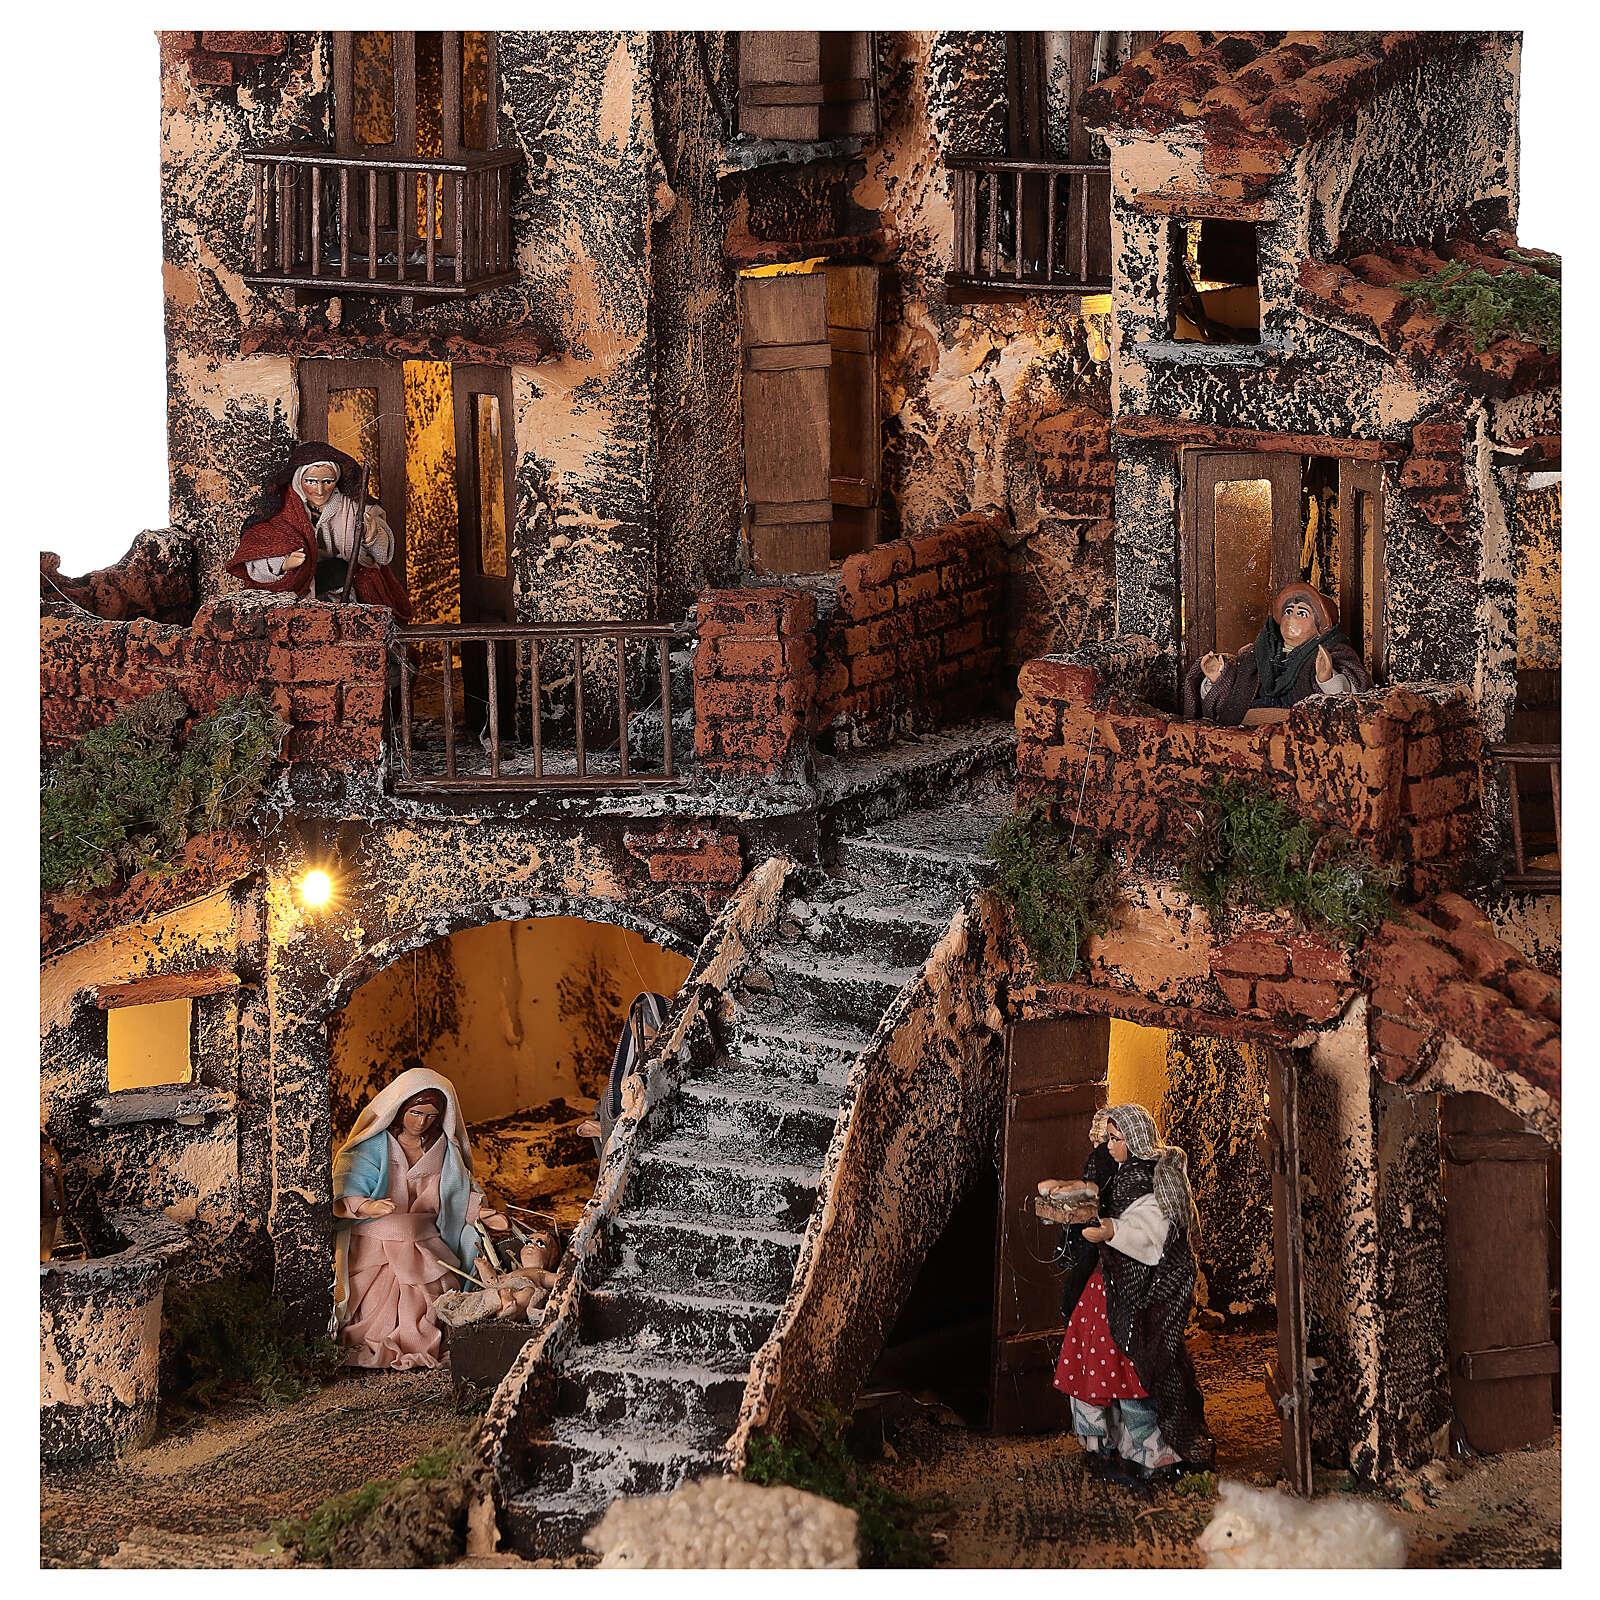 Neapolitan Nativity Scene three levels light fountain 45x45x45 cm for figurines of 8 cm average height 4